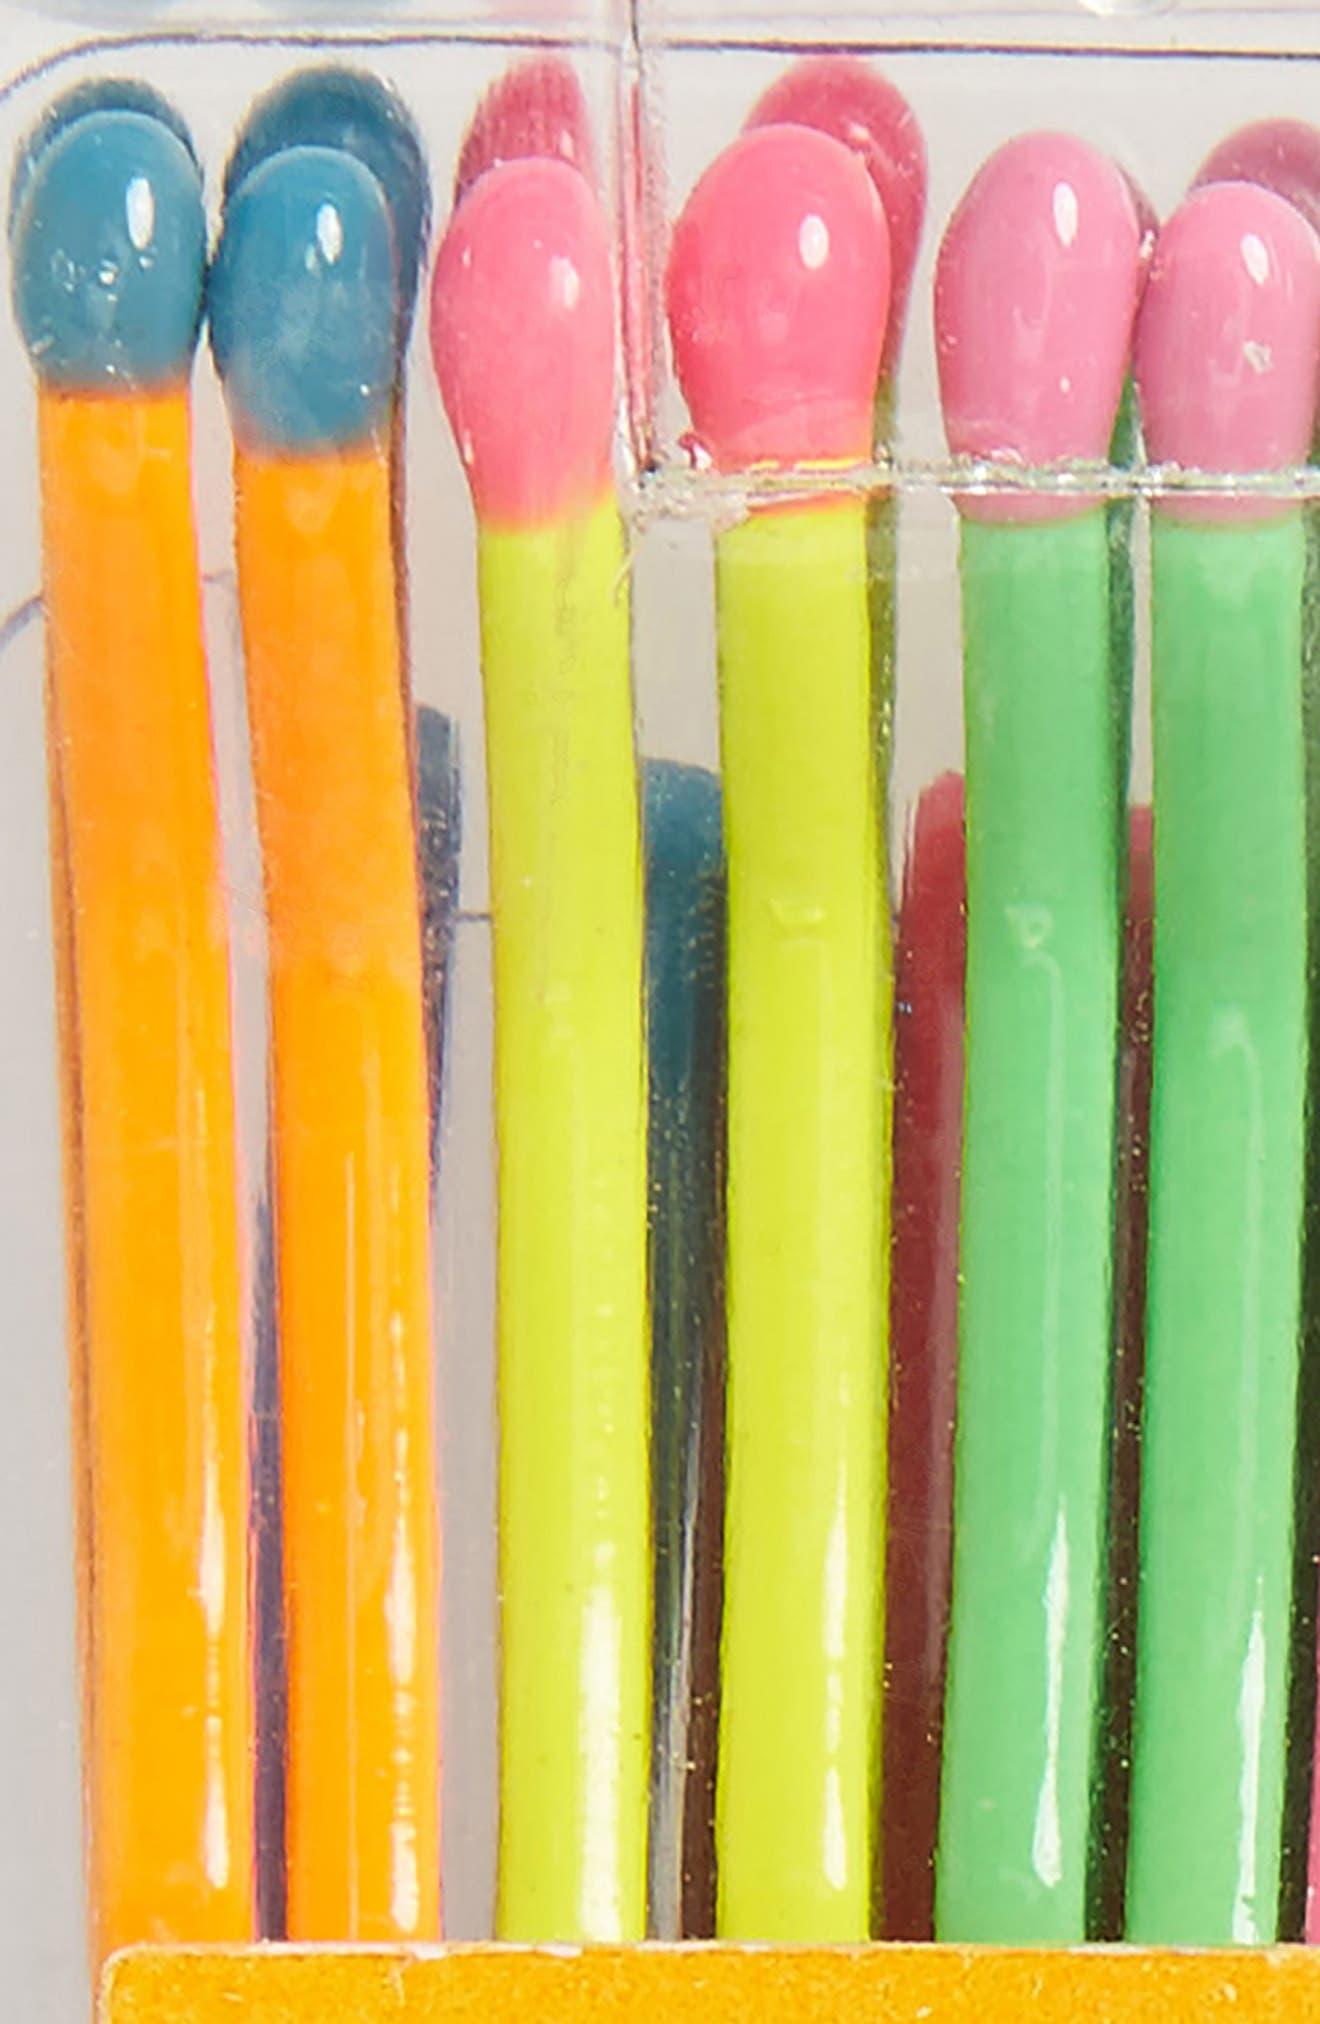 Alternate Image 2  - Jane Tran Neon Rainbow Matchsticks Set of 20 Assorted Bobby Pins